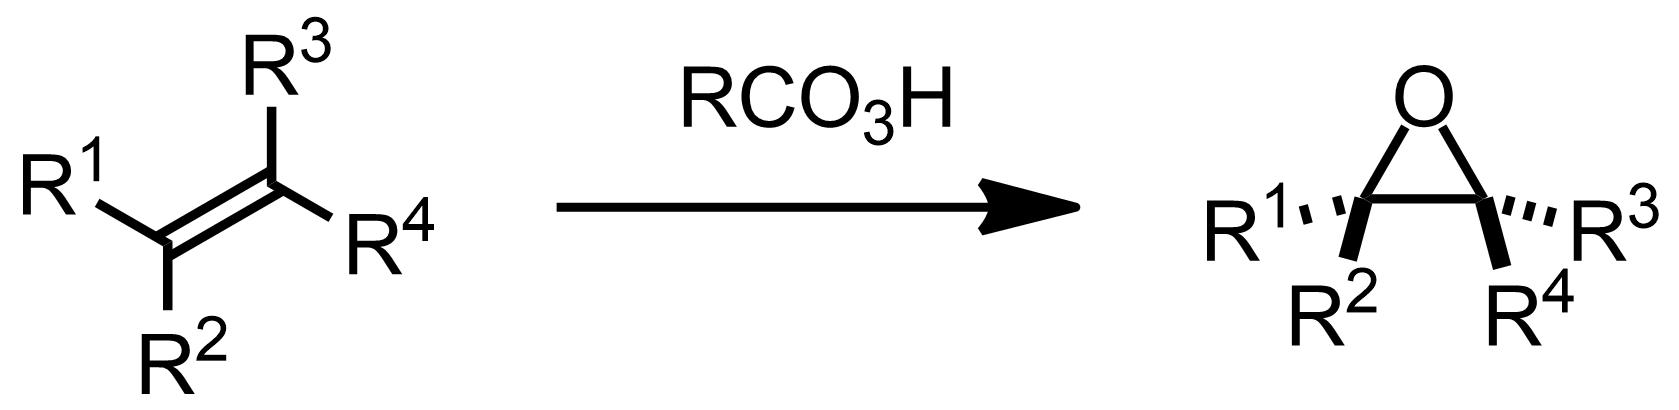 Schematic representation of the Prilezhaev Reaction.